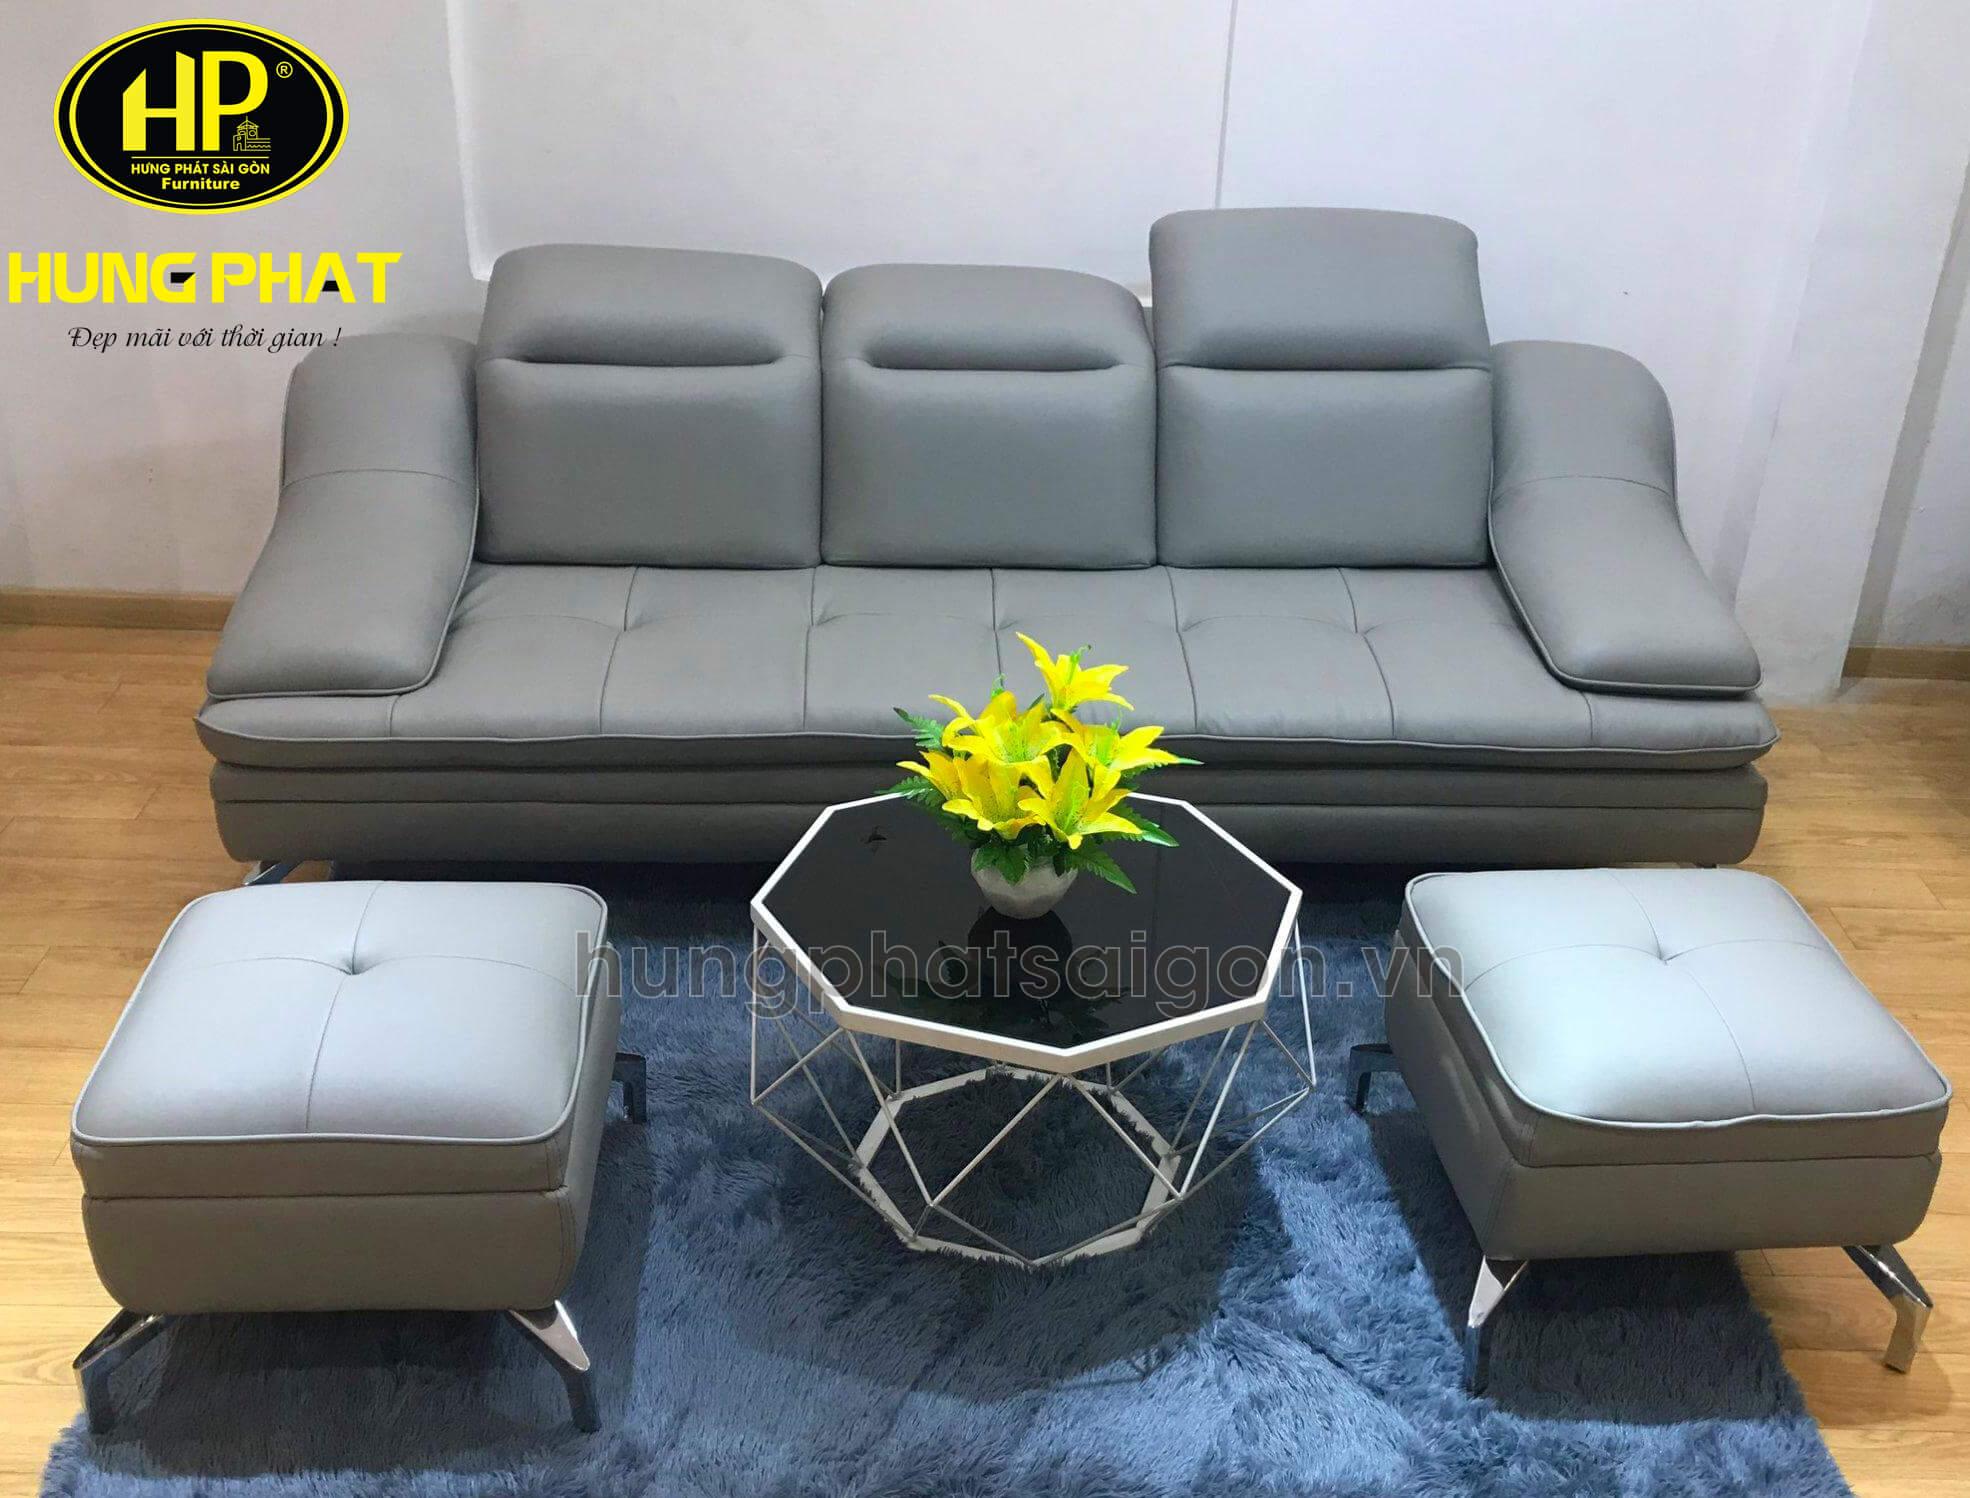 ghe-sofa-bang-phong-khach-chat-lieu-da-cao-cap-hungphatsaigon.vn-2